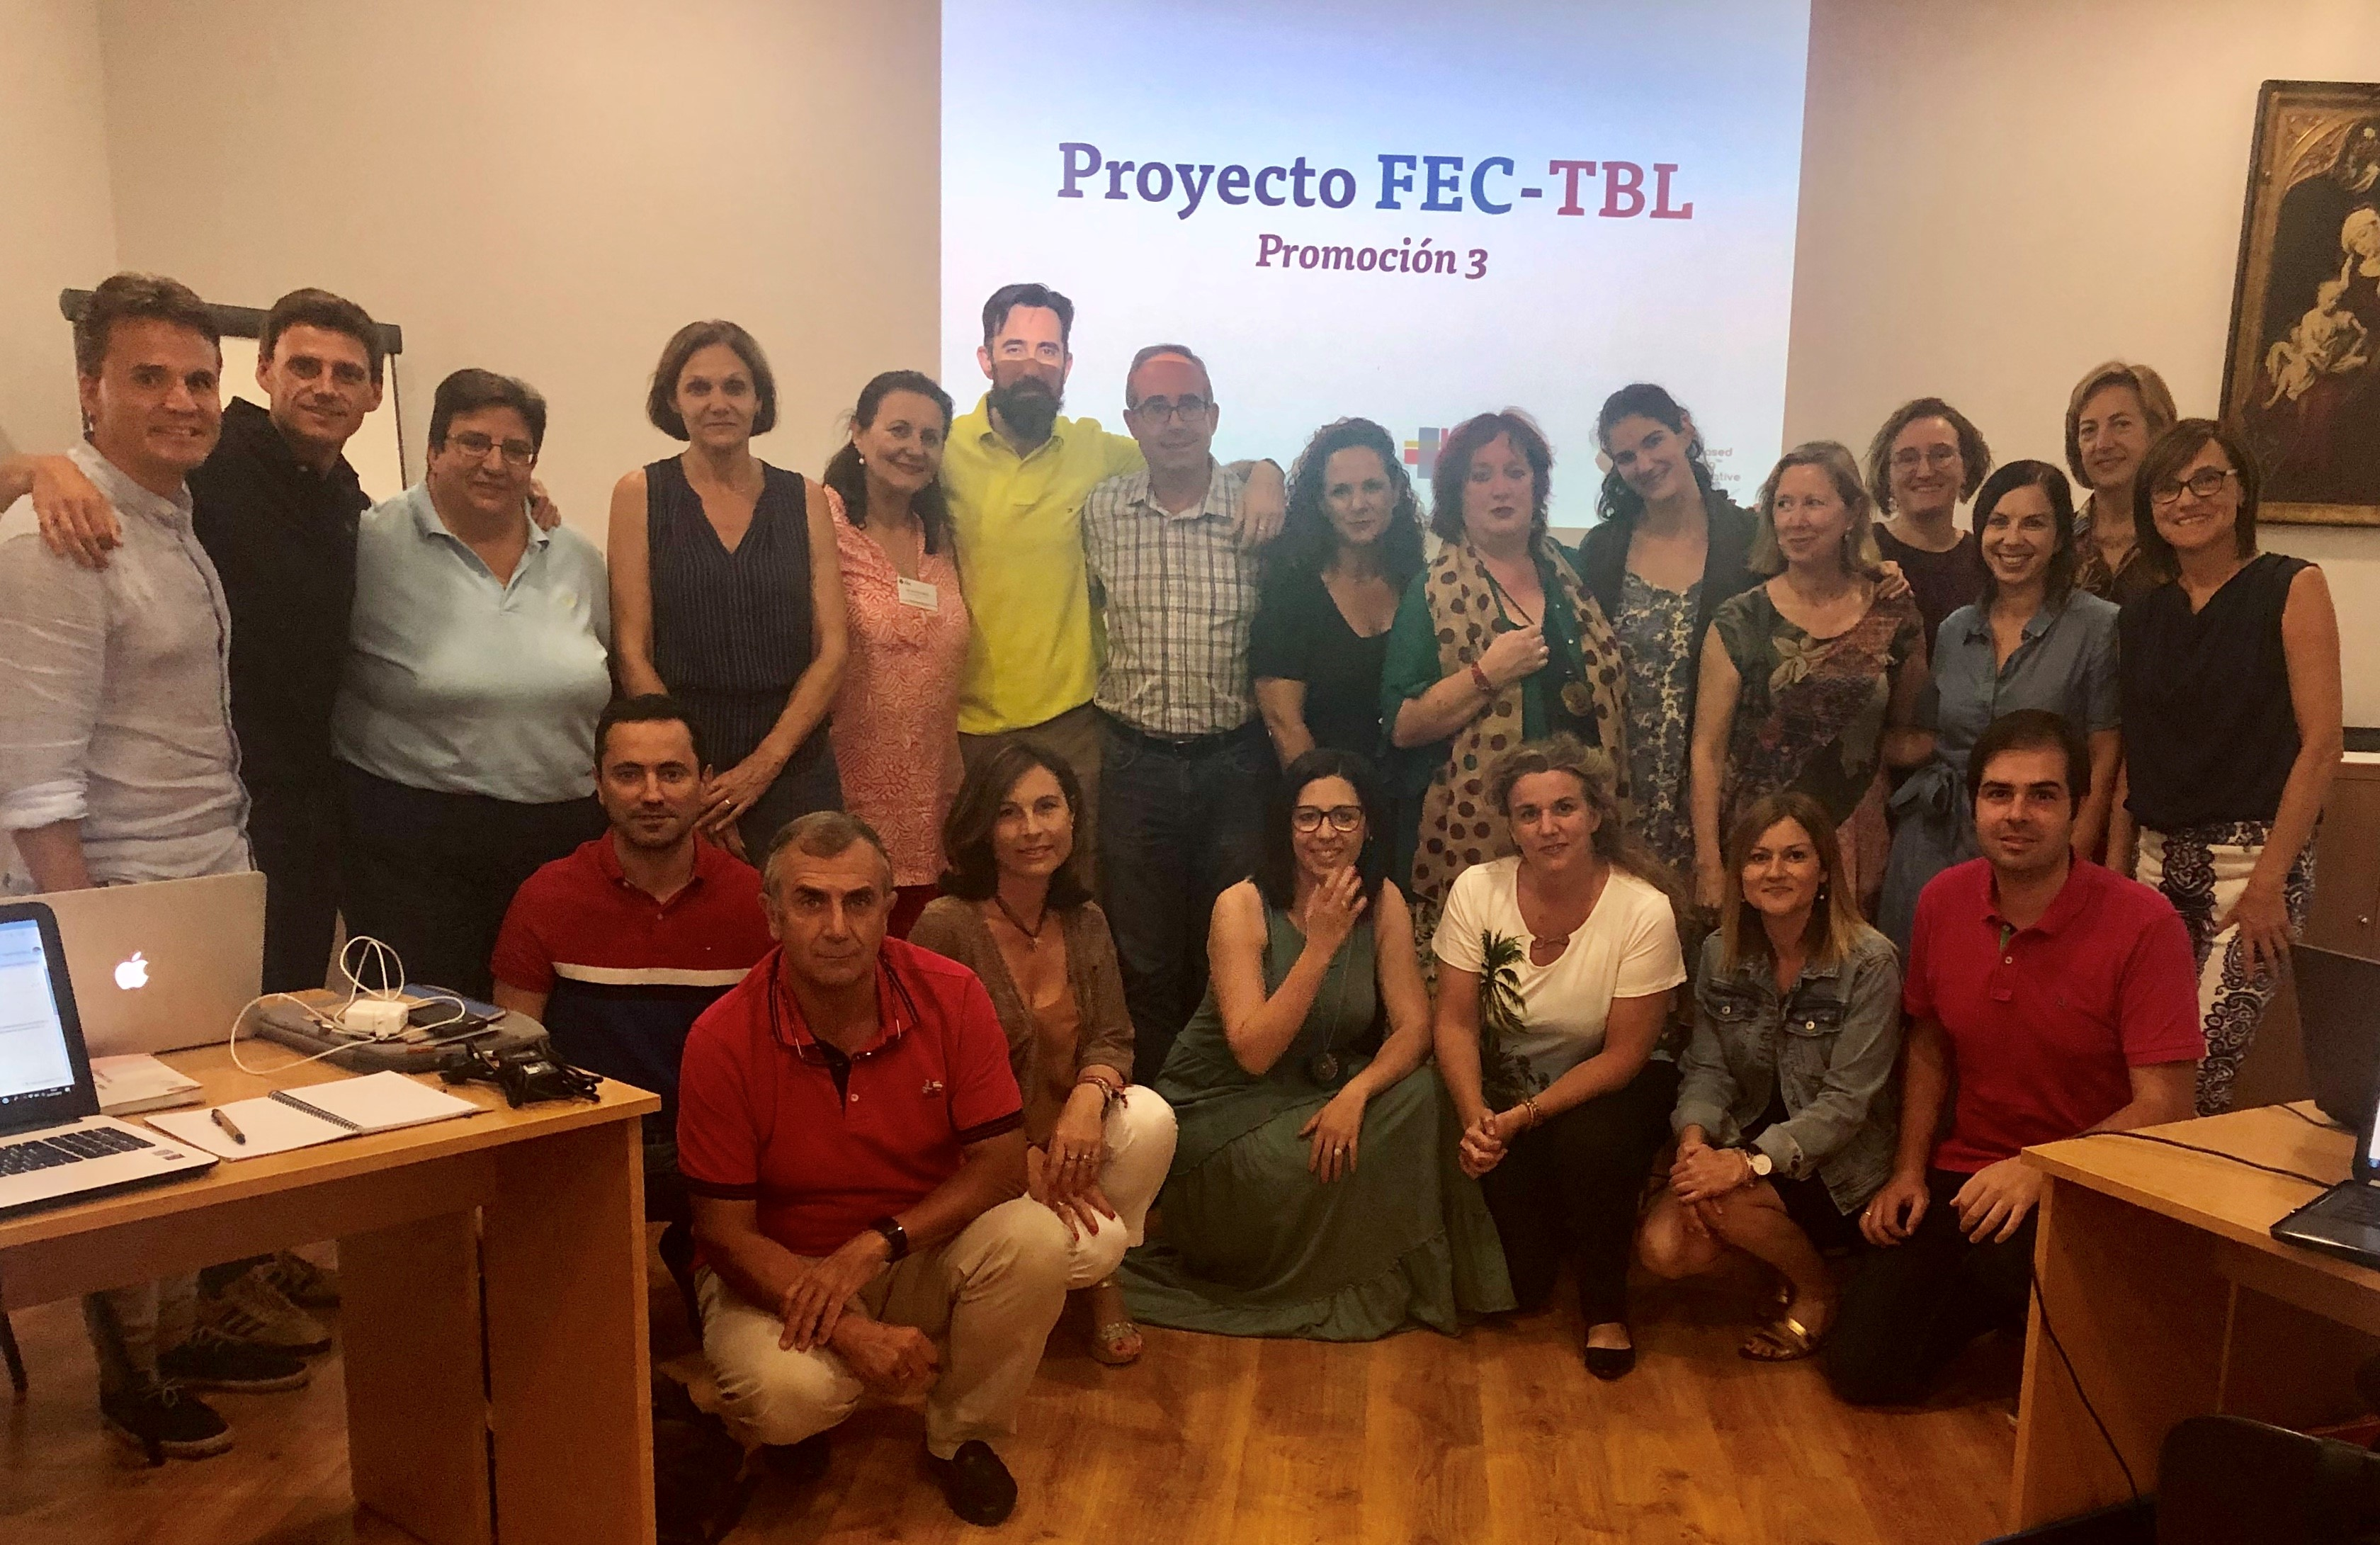 Tercera promoción de profesores que se incorpora a la Comunidad de Aprendizaje FEC-TBL